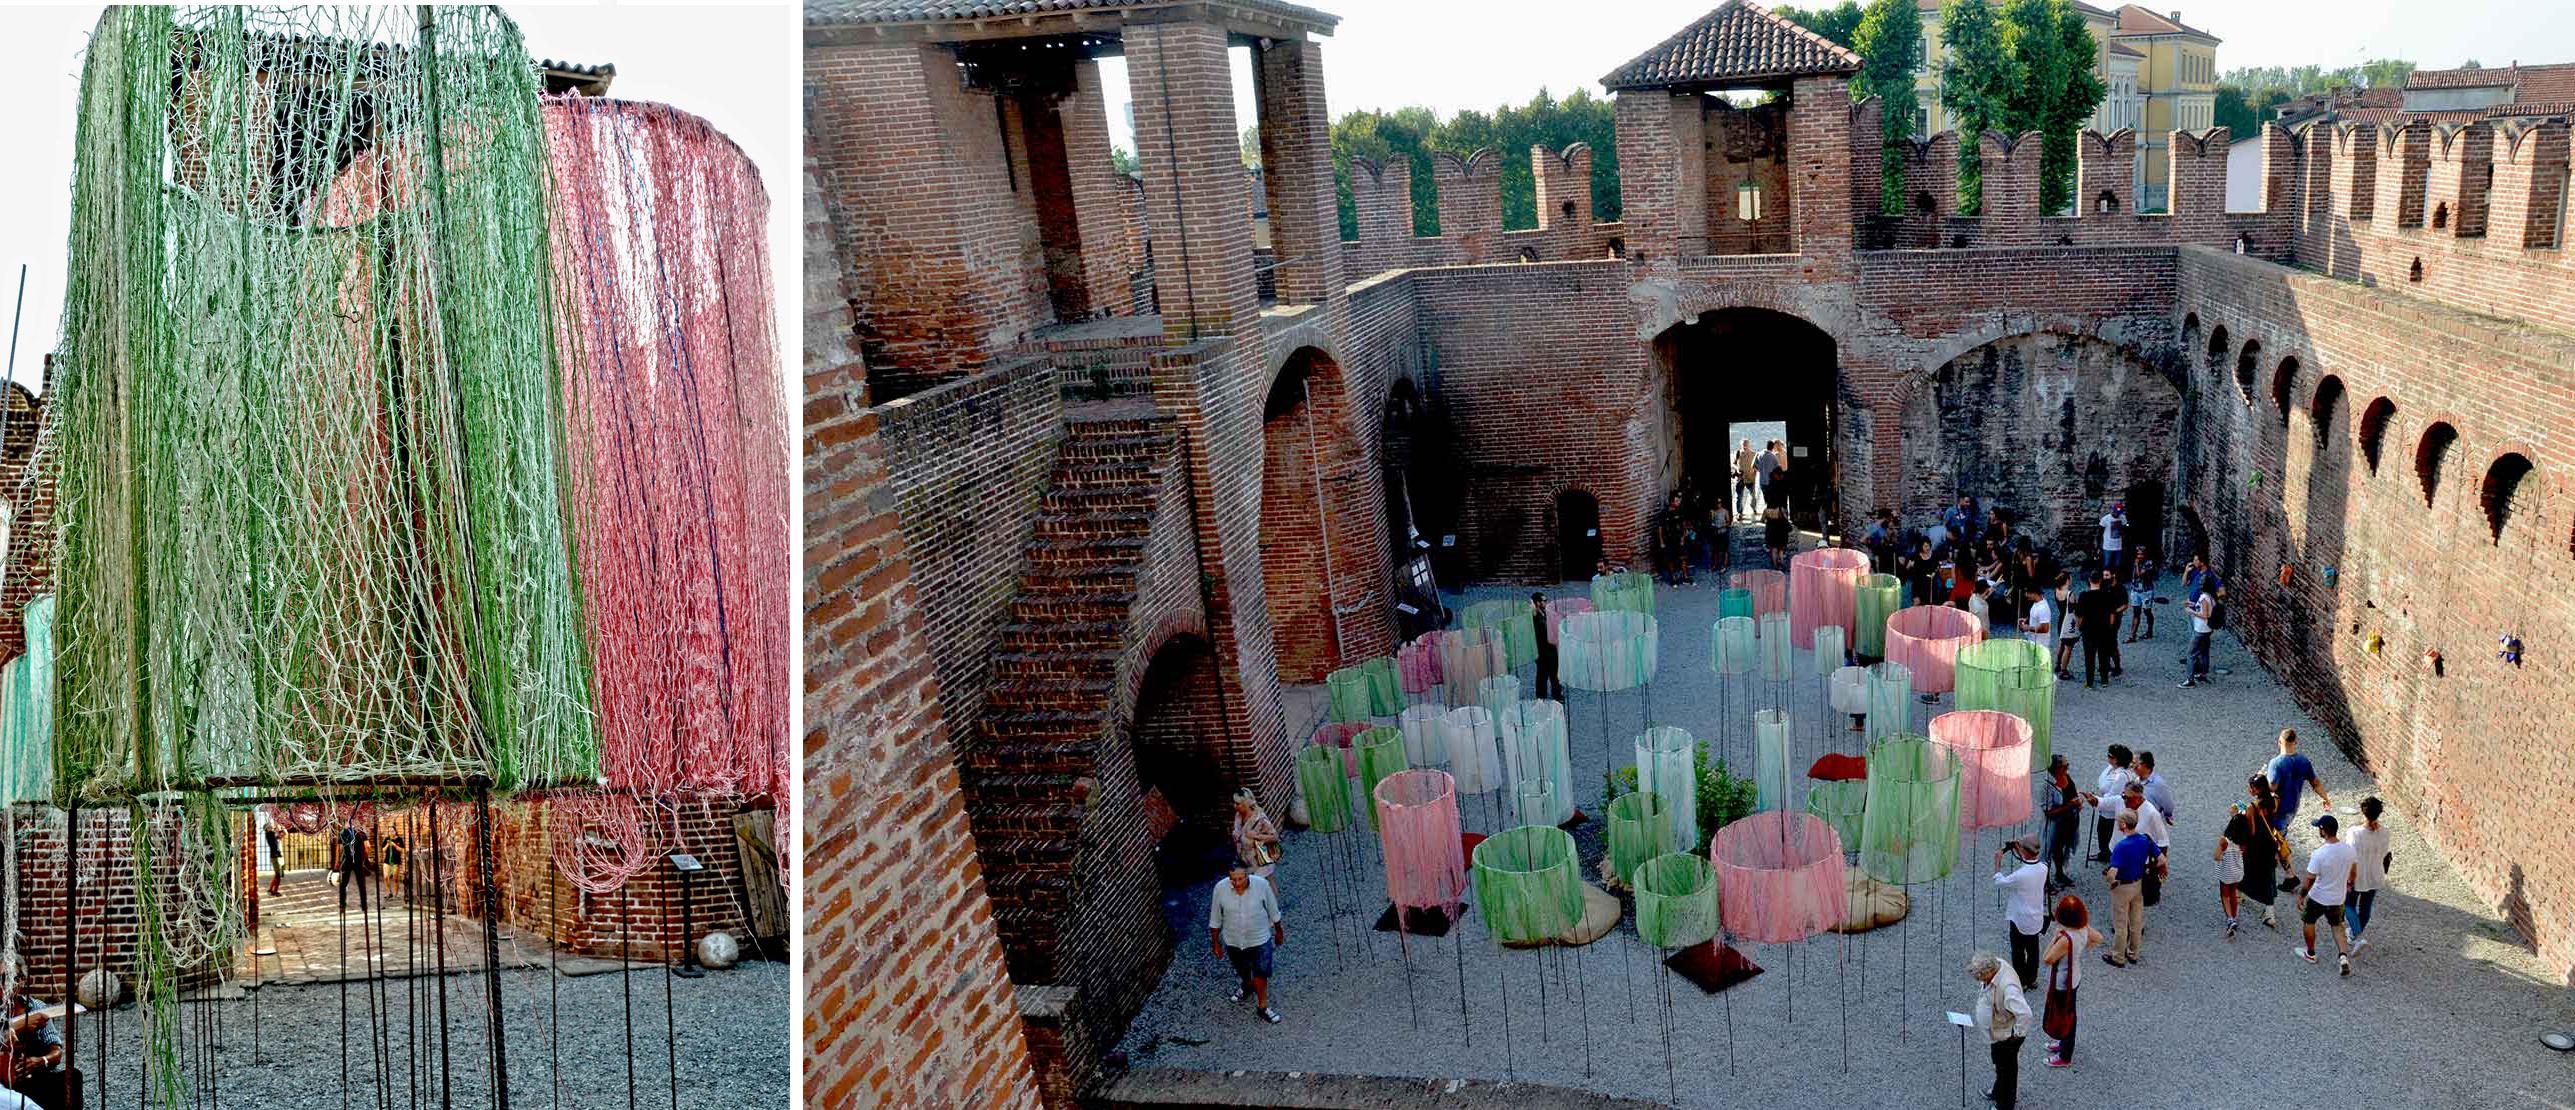 Biennale d'arte di Soncino